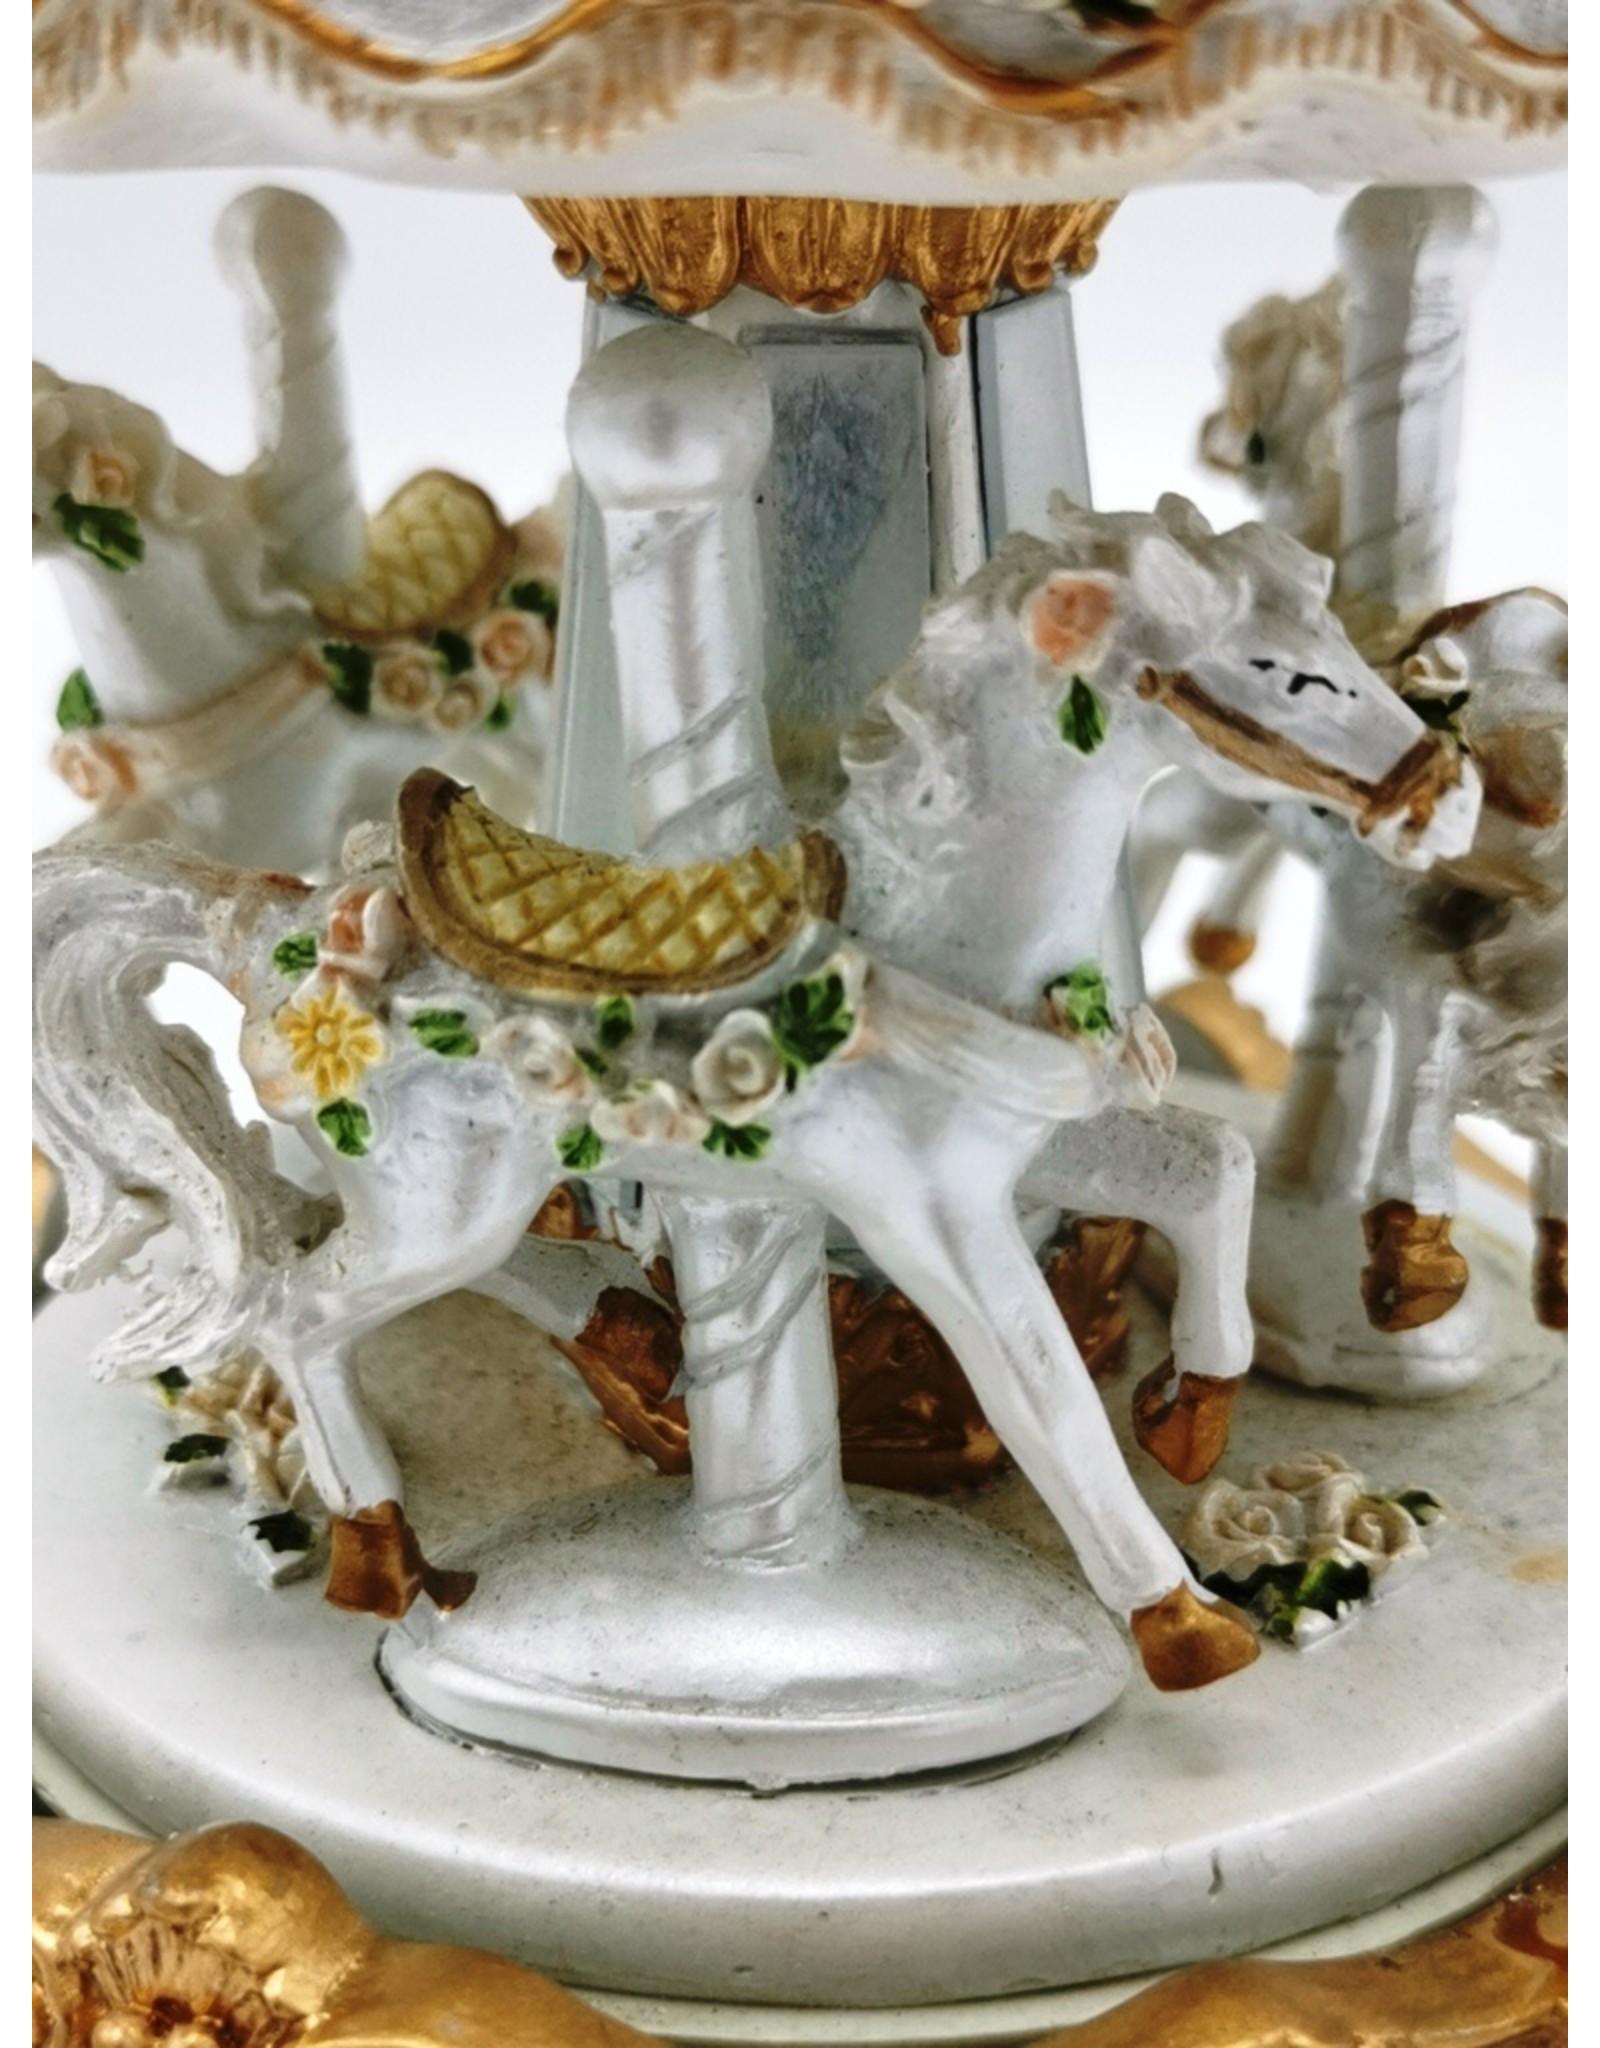 SH Giftware & Lifestyle - Muziekdoos Vintage Carrousel  (medium)